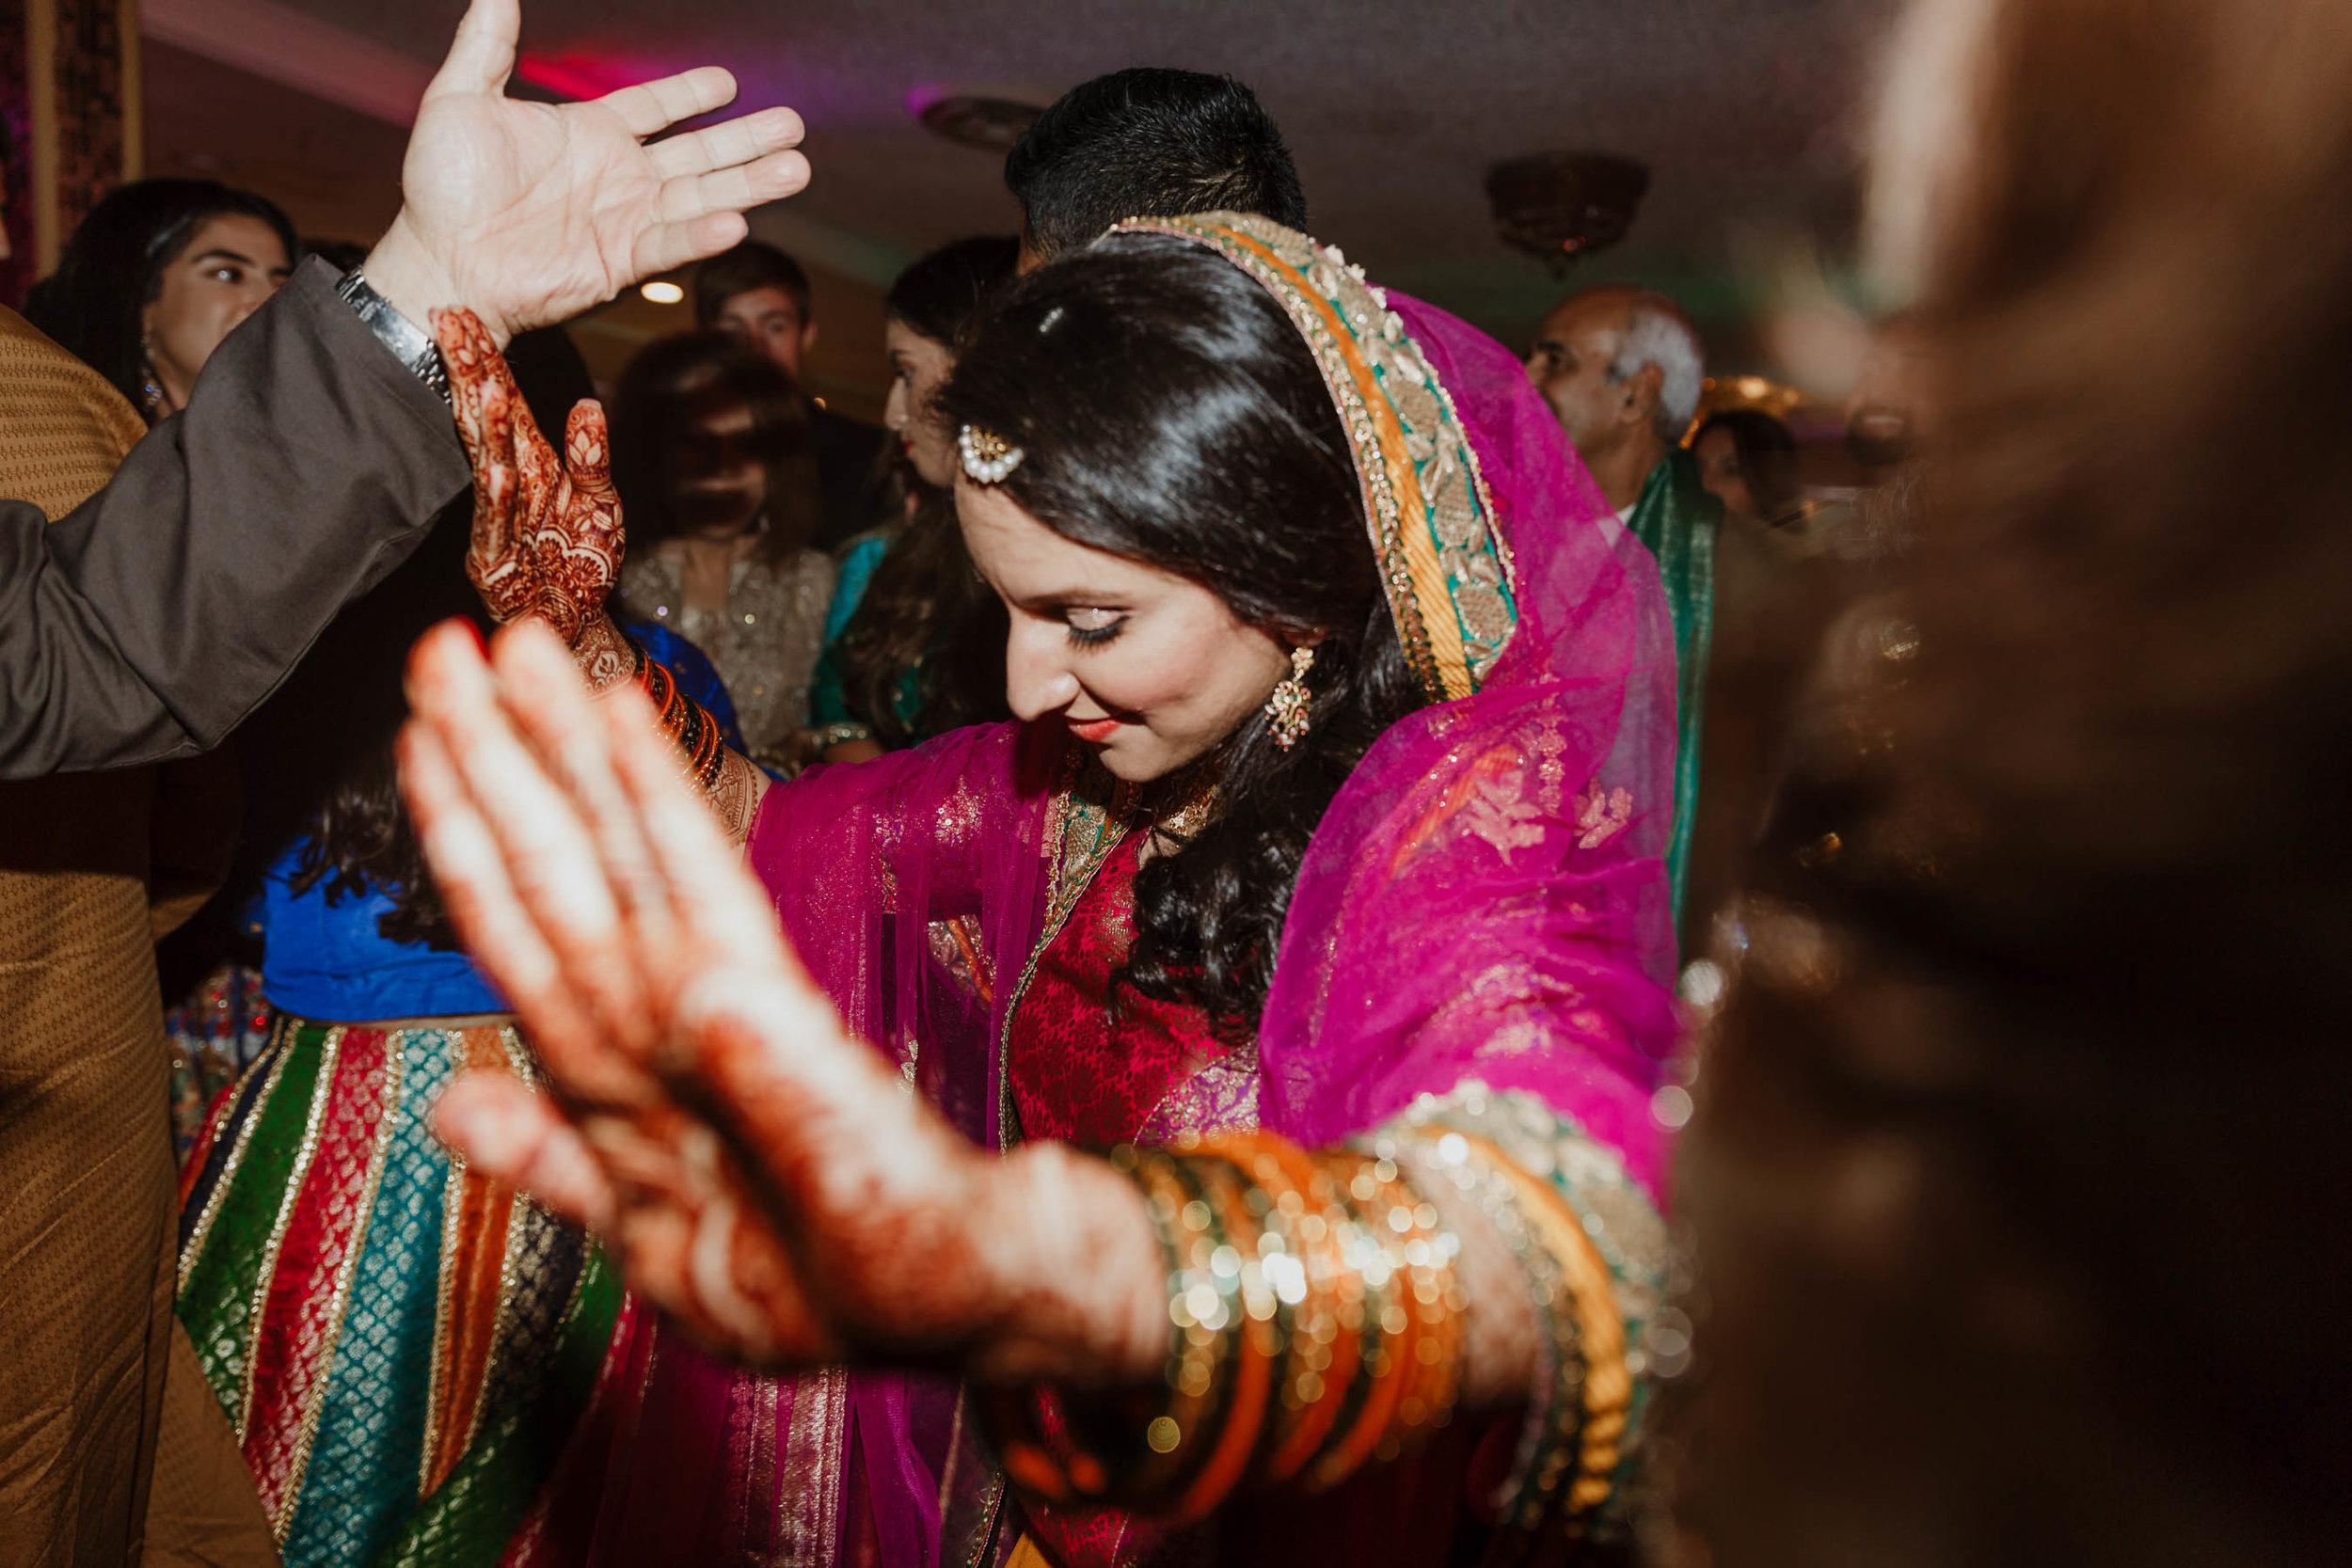 nyc-longisland-best-indian-wedding-photographer-24.jpg